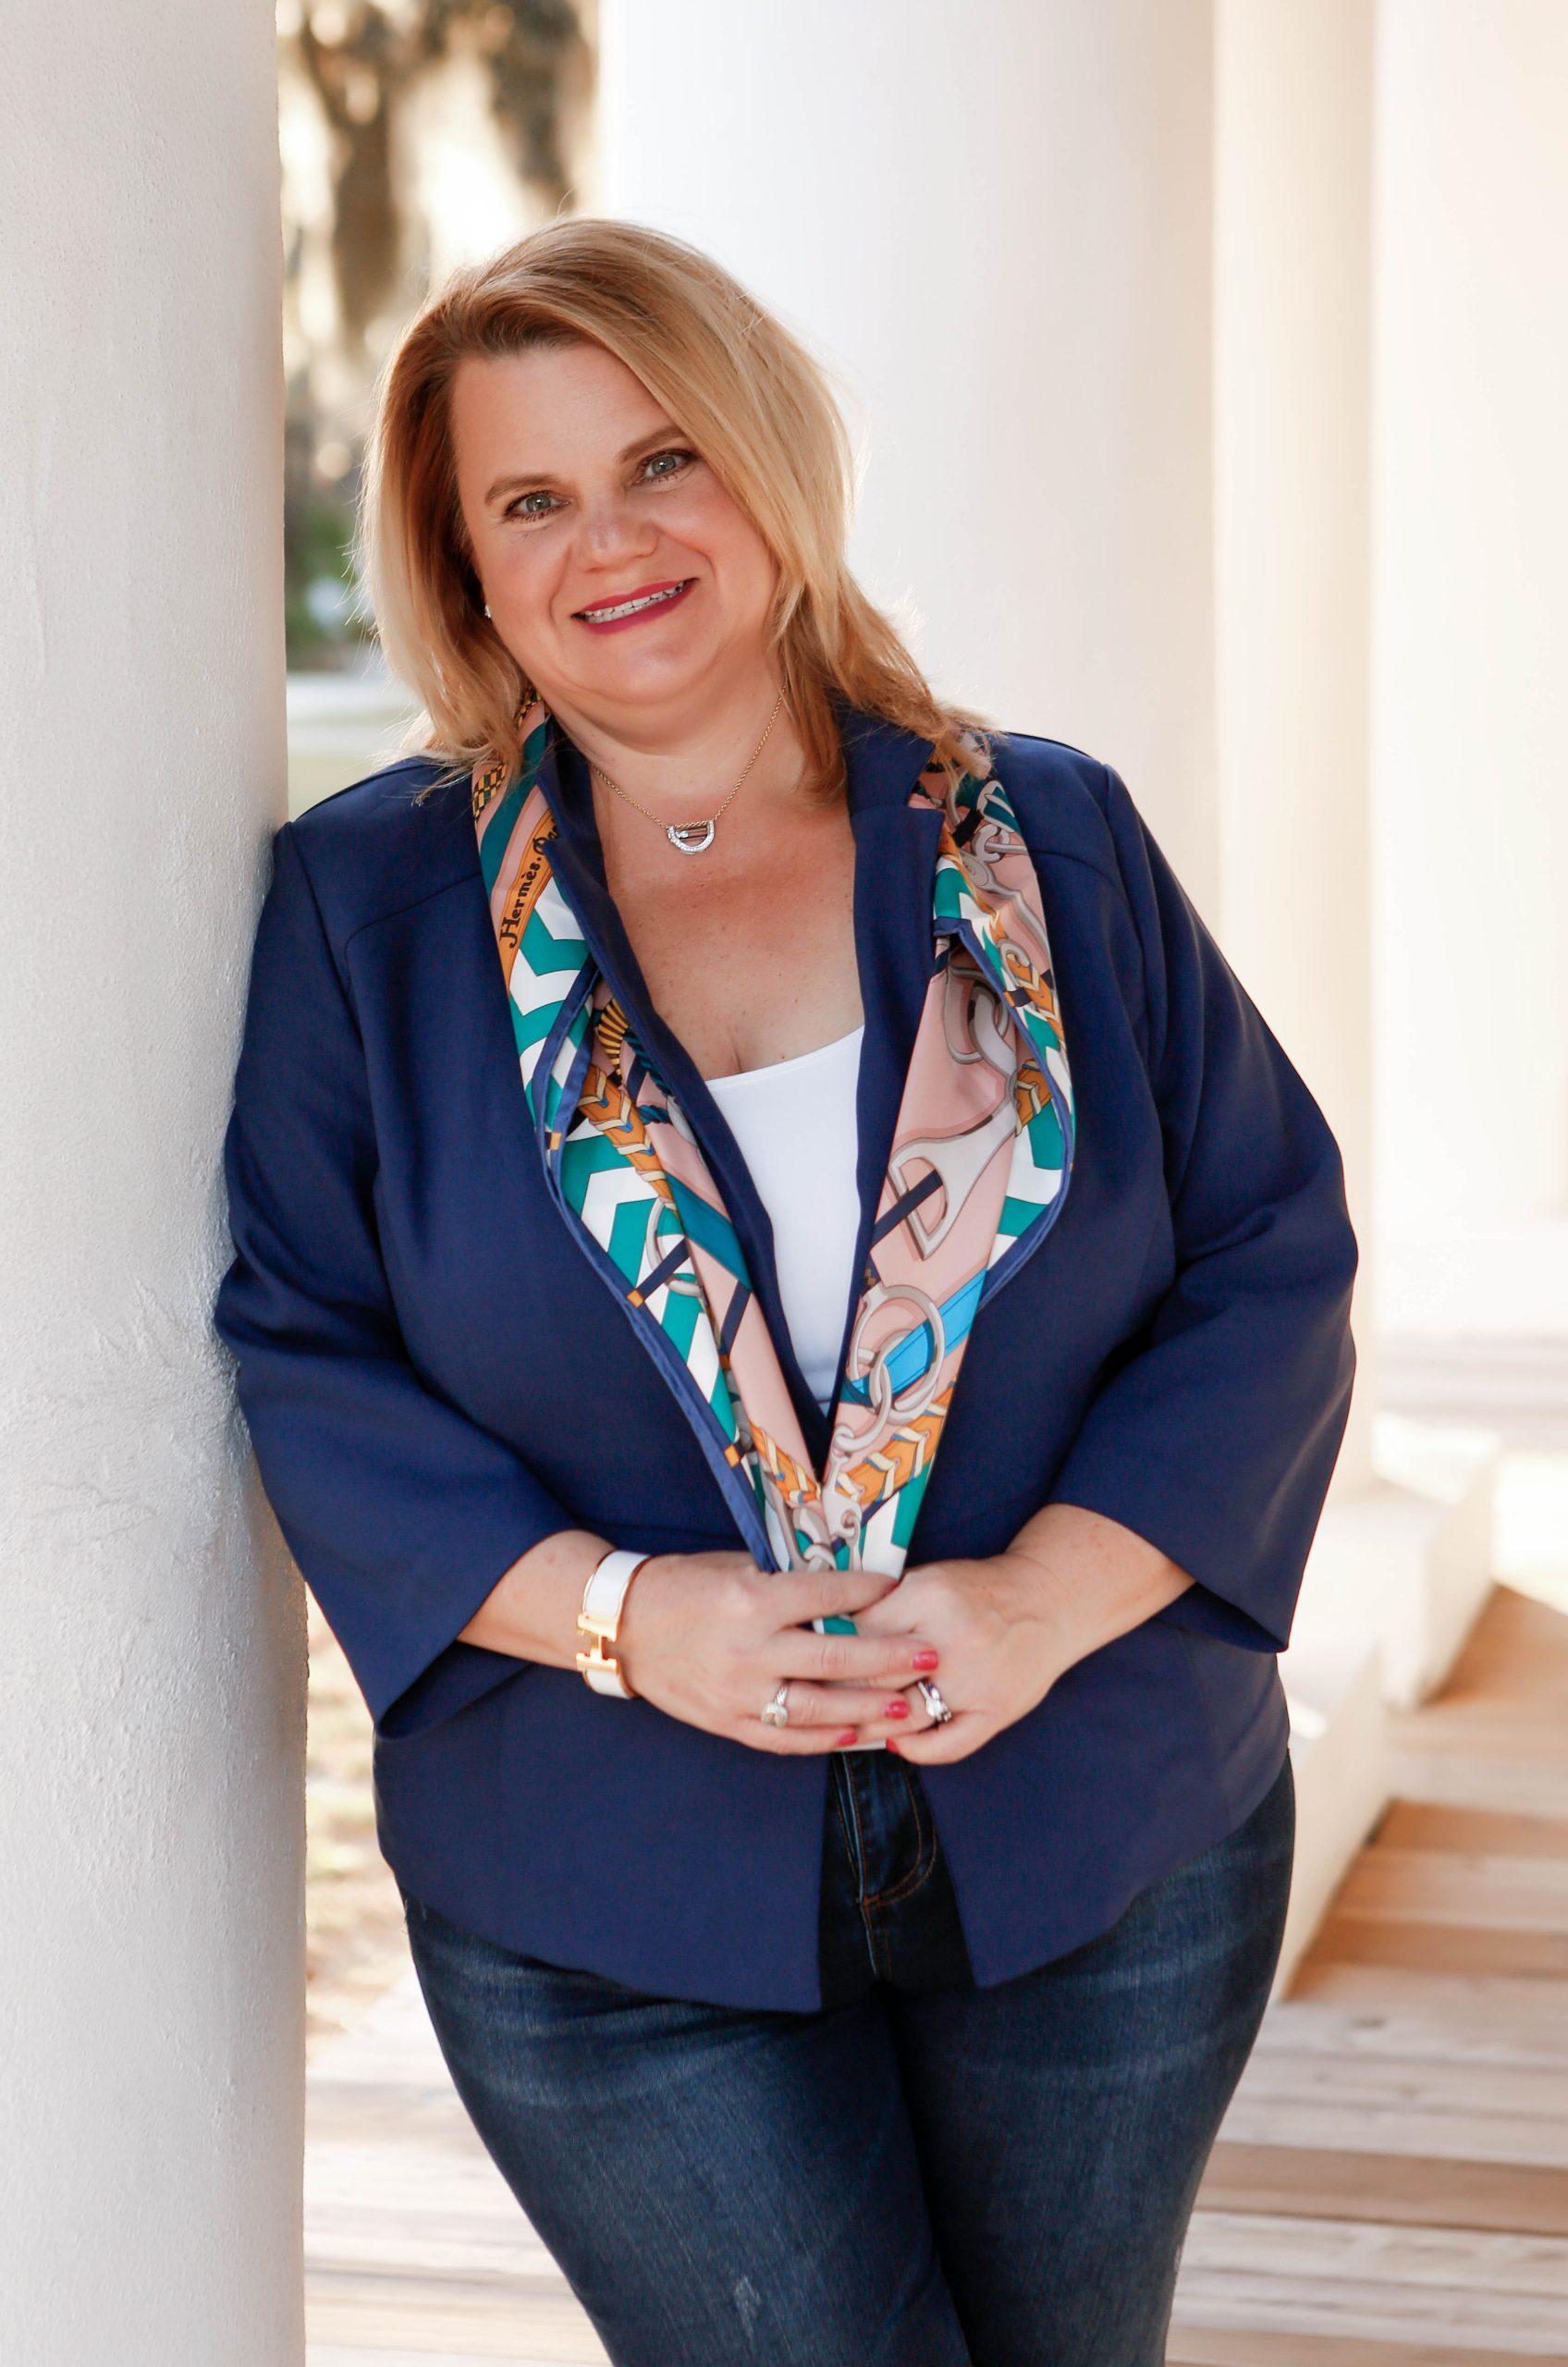 Lisa Marie Runfola in blue leaning against a column